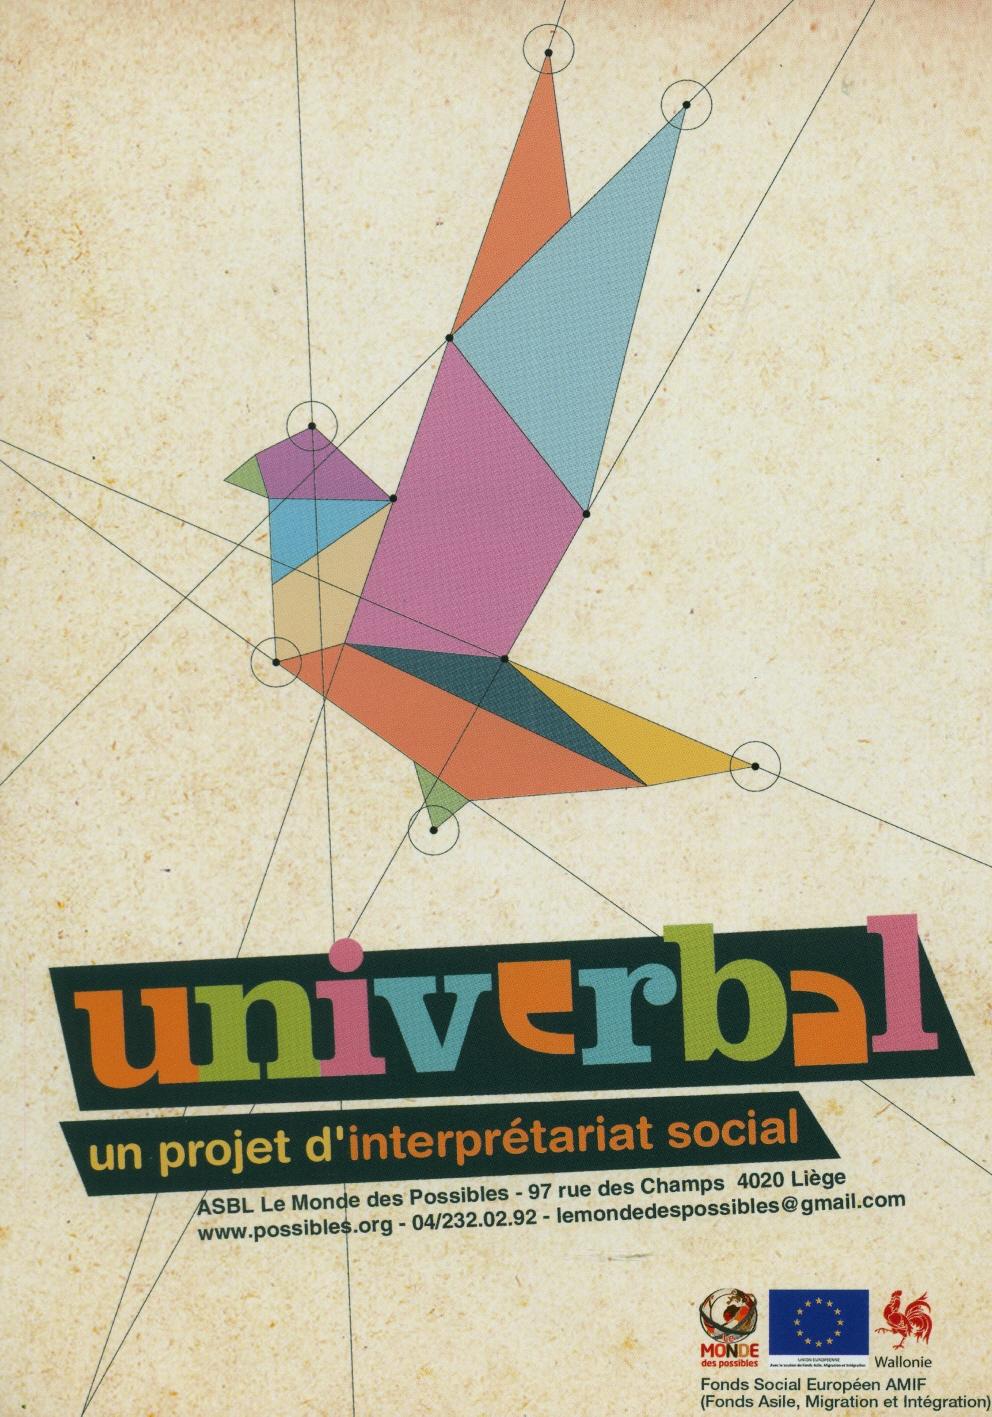 logo univerbal0001